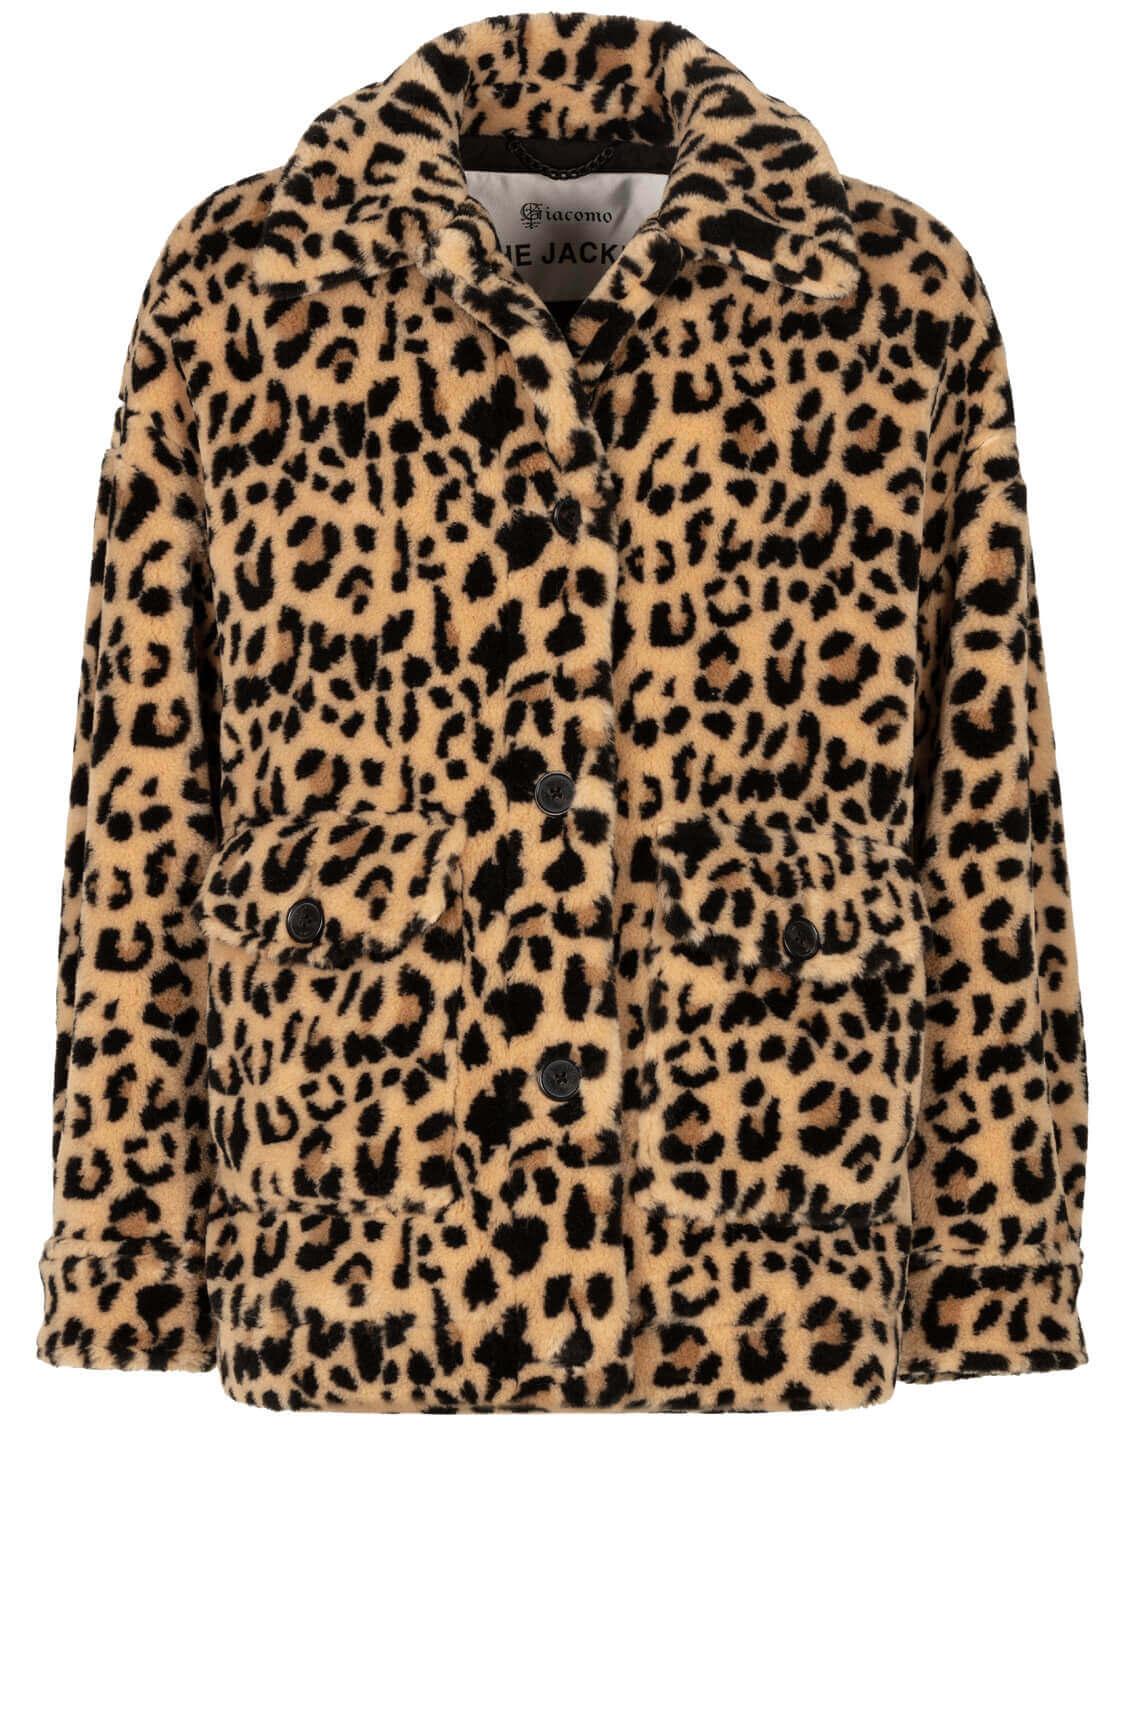 Giacomo Dames Fake fur luipaard jas Bruin